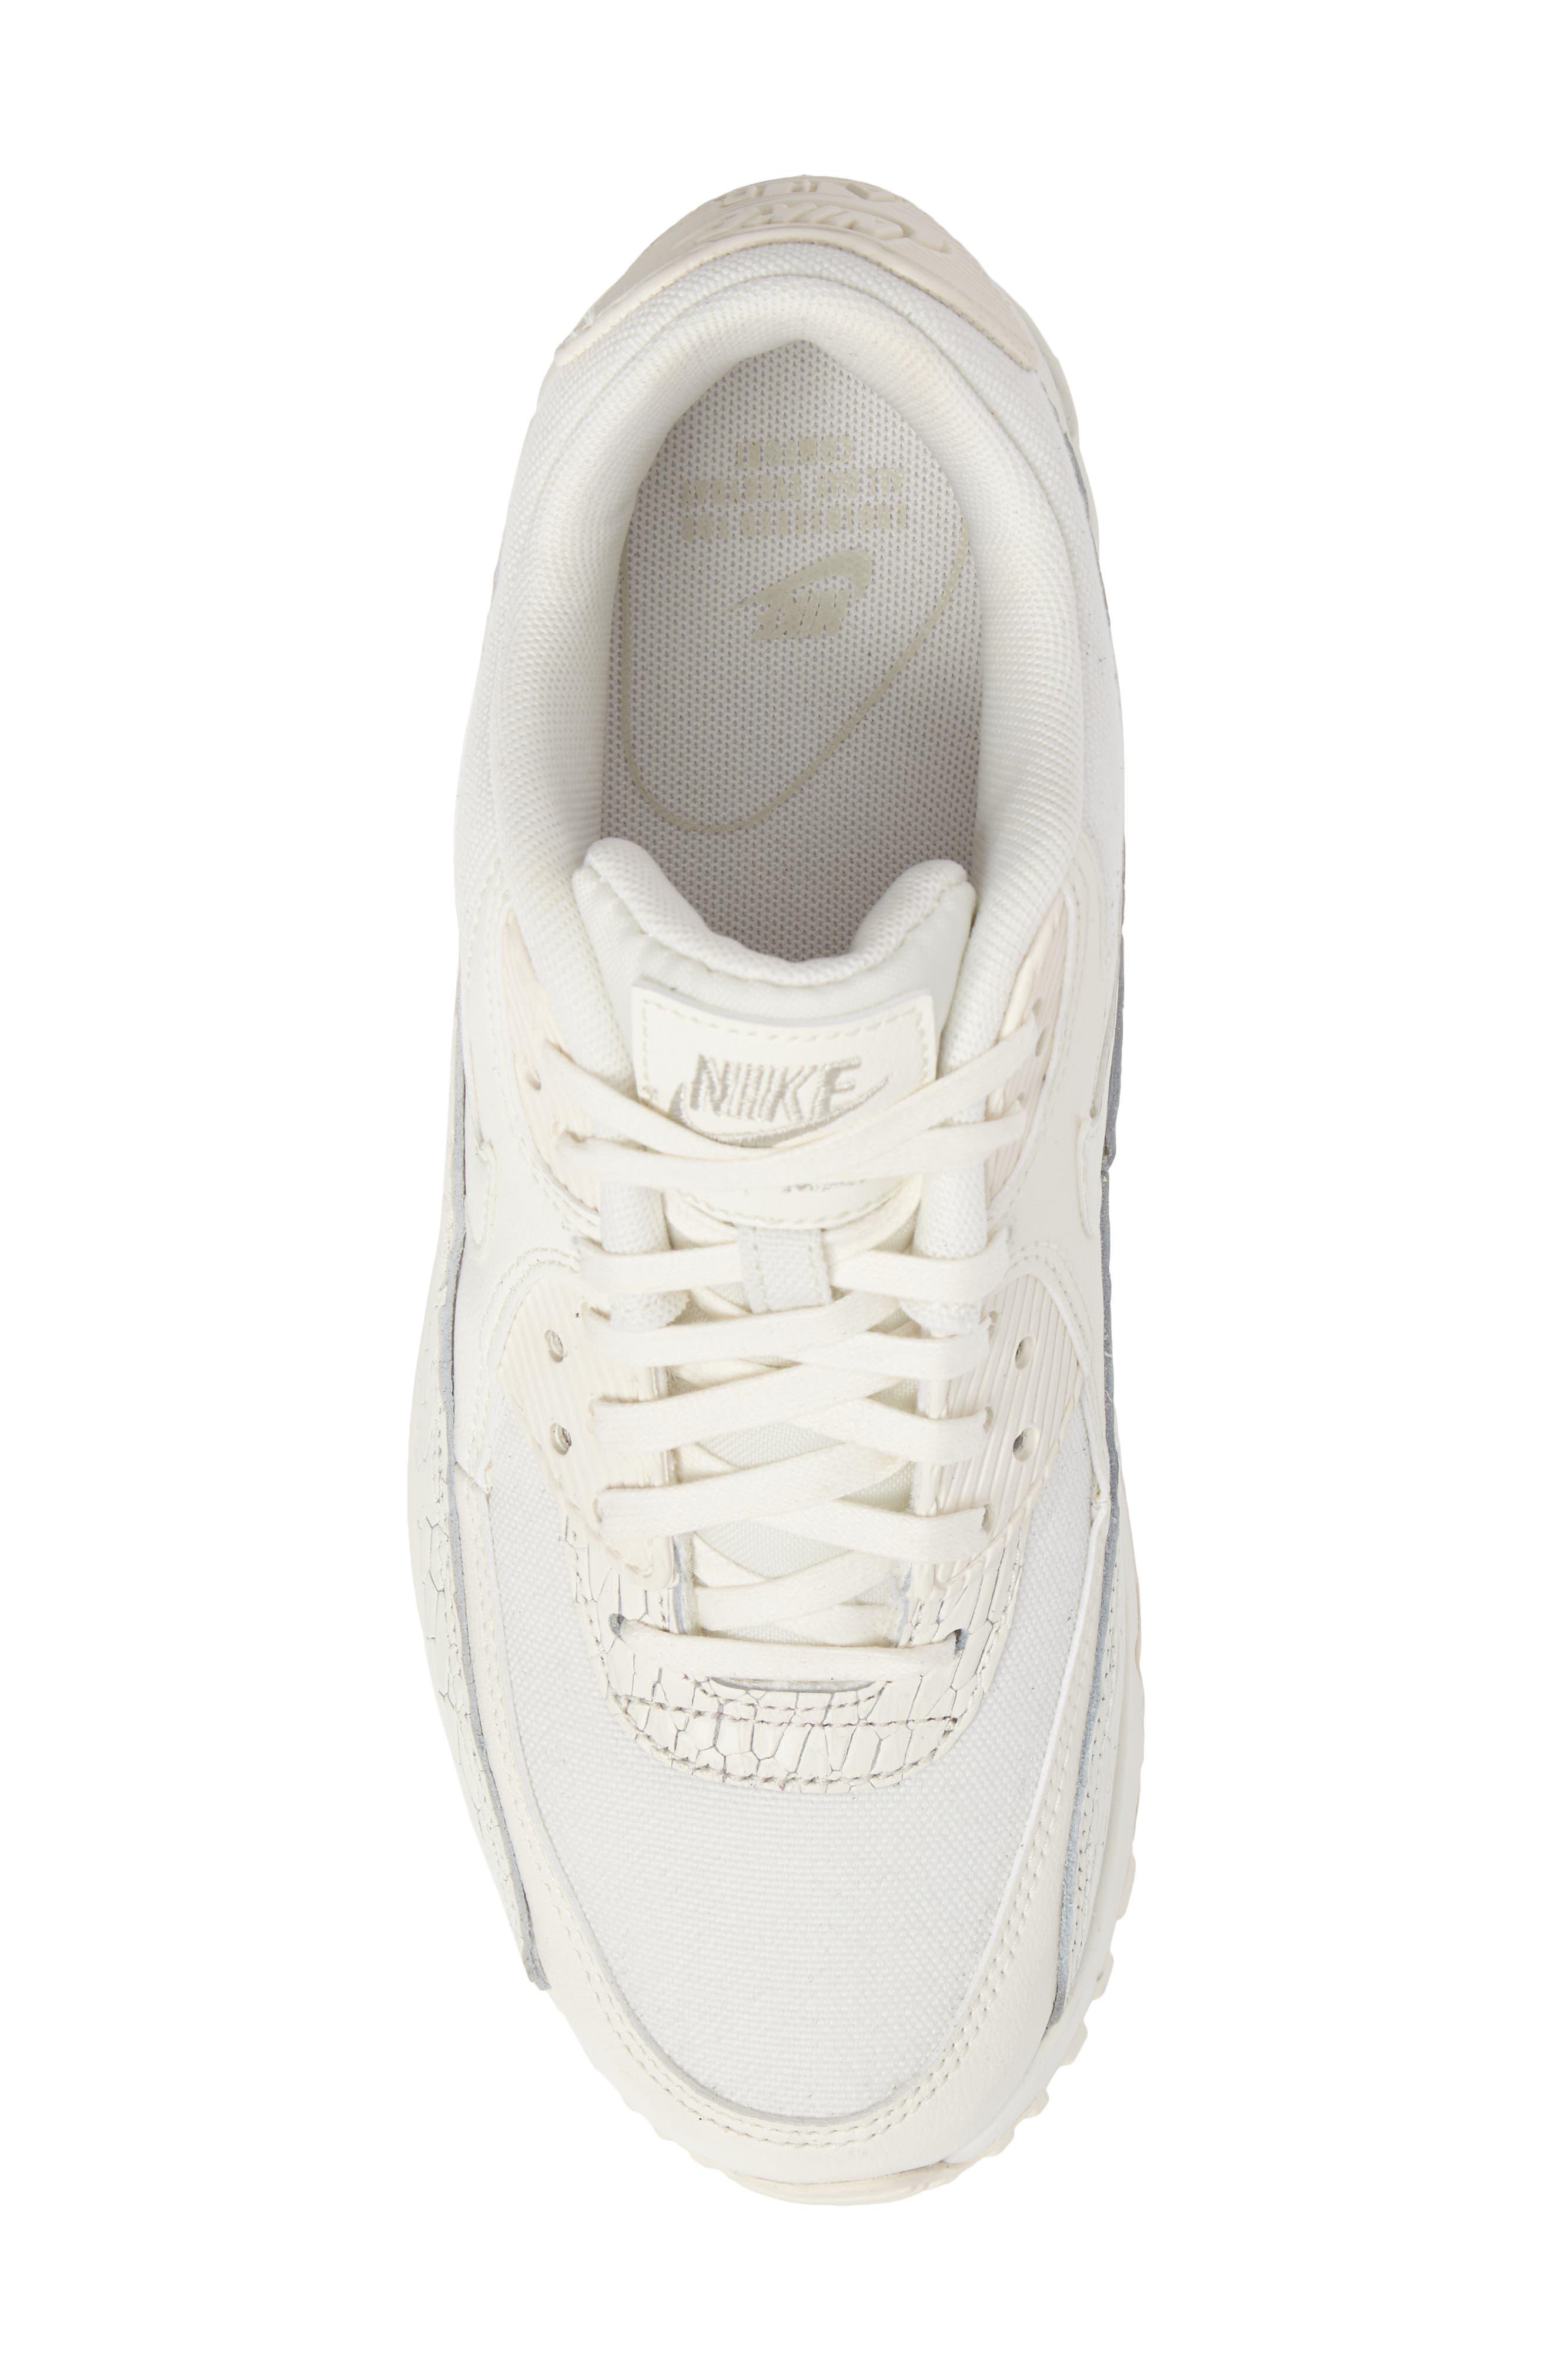 Air Max 90 Premium Leather Sneaker,                             Alternate thumbnail 5, color,                             250